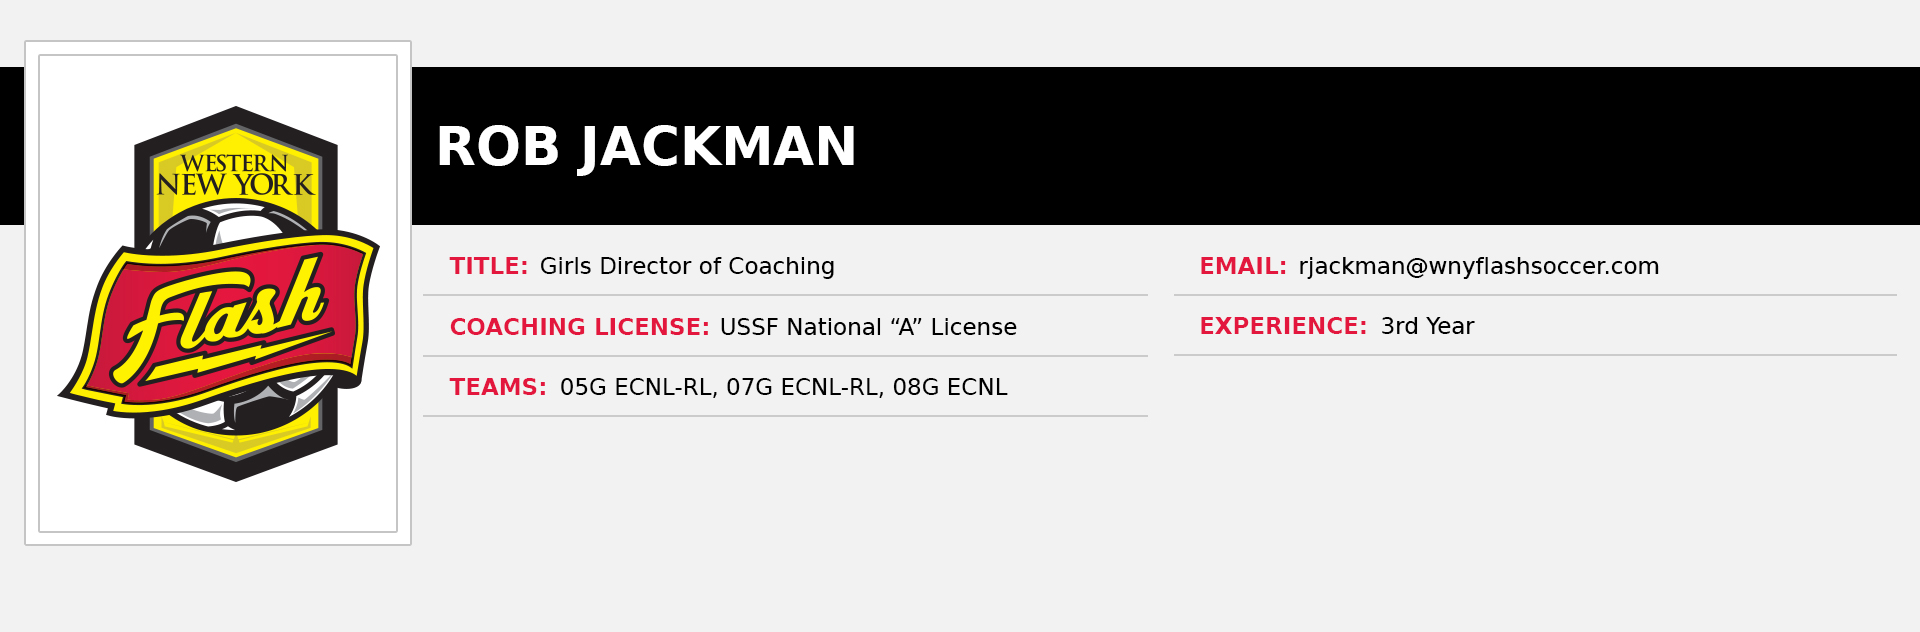 Rob Jackman